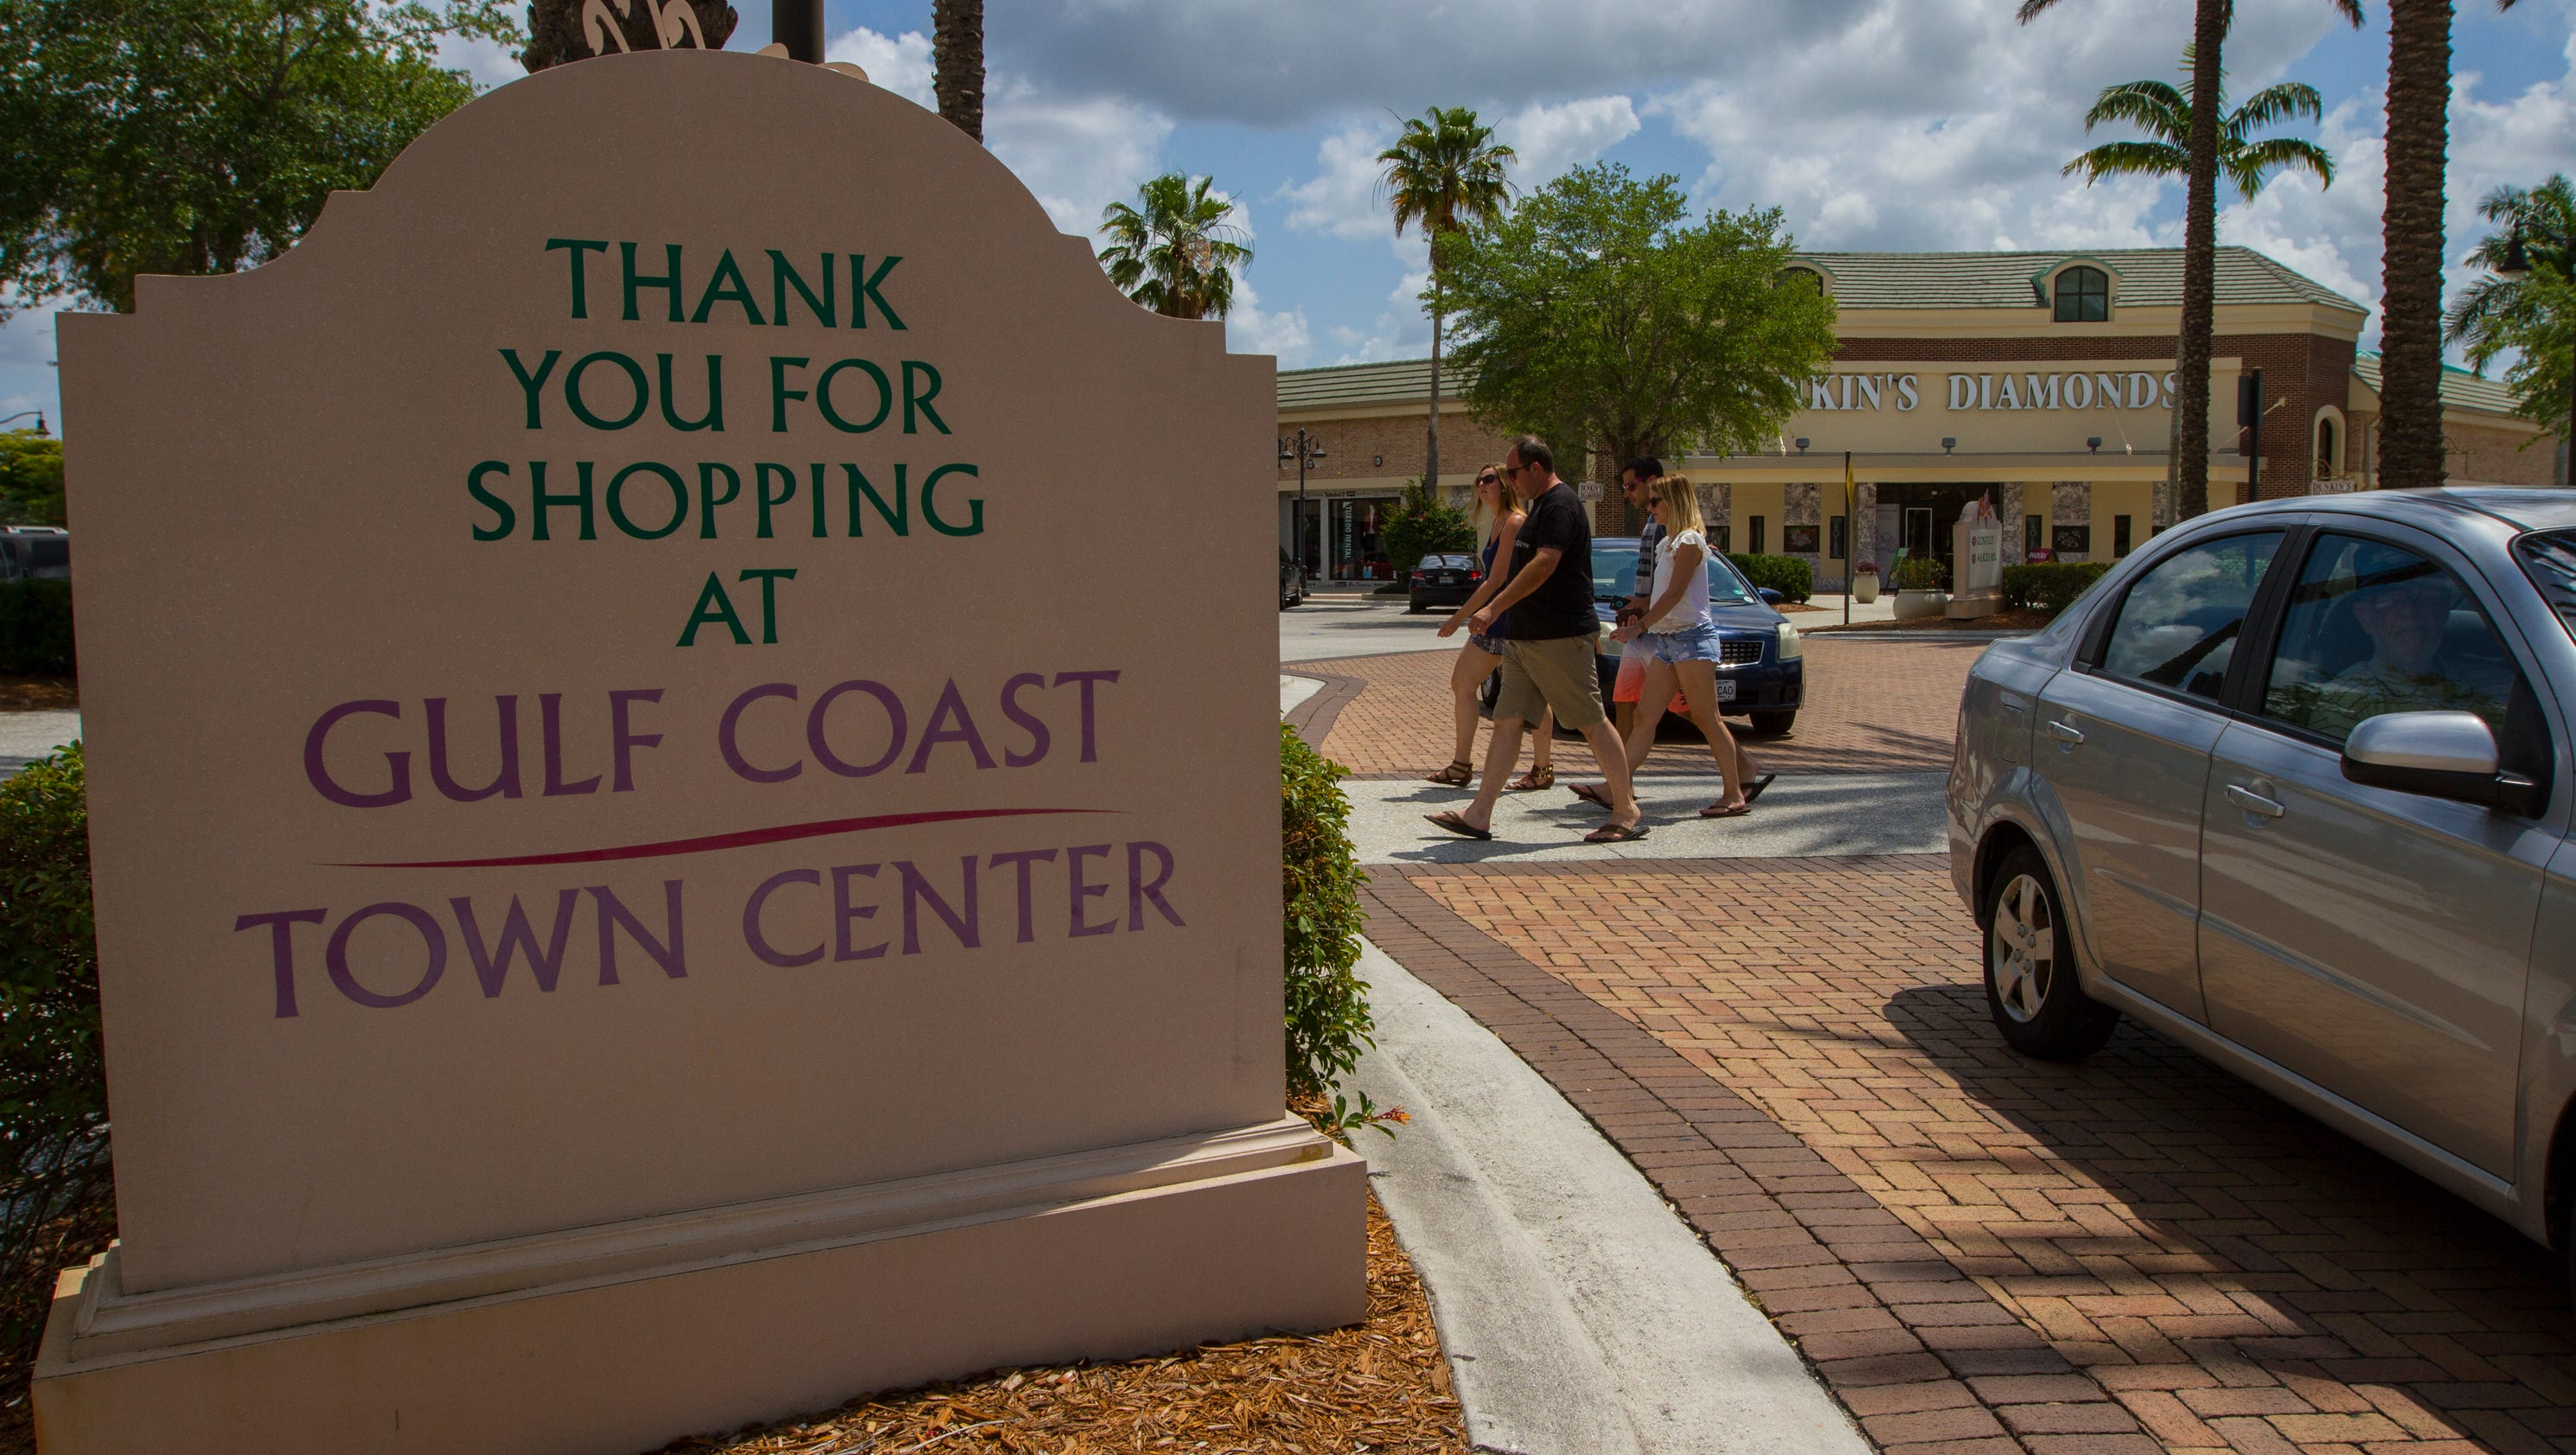 IRMA Gulf Coast Town Center Begins Opening Stores Restaurants - Babies r us gulf coast town center